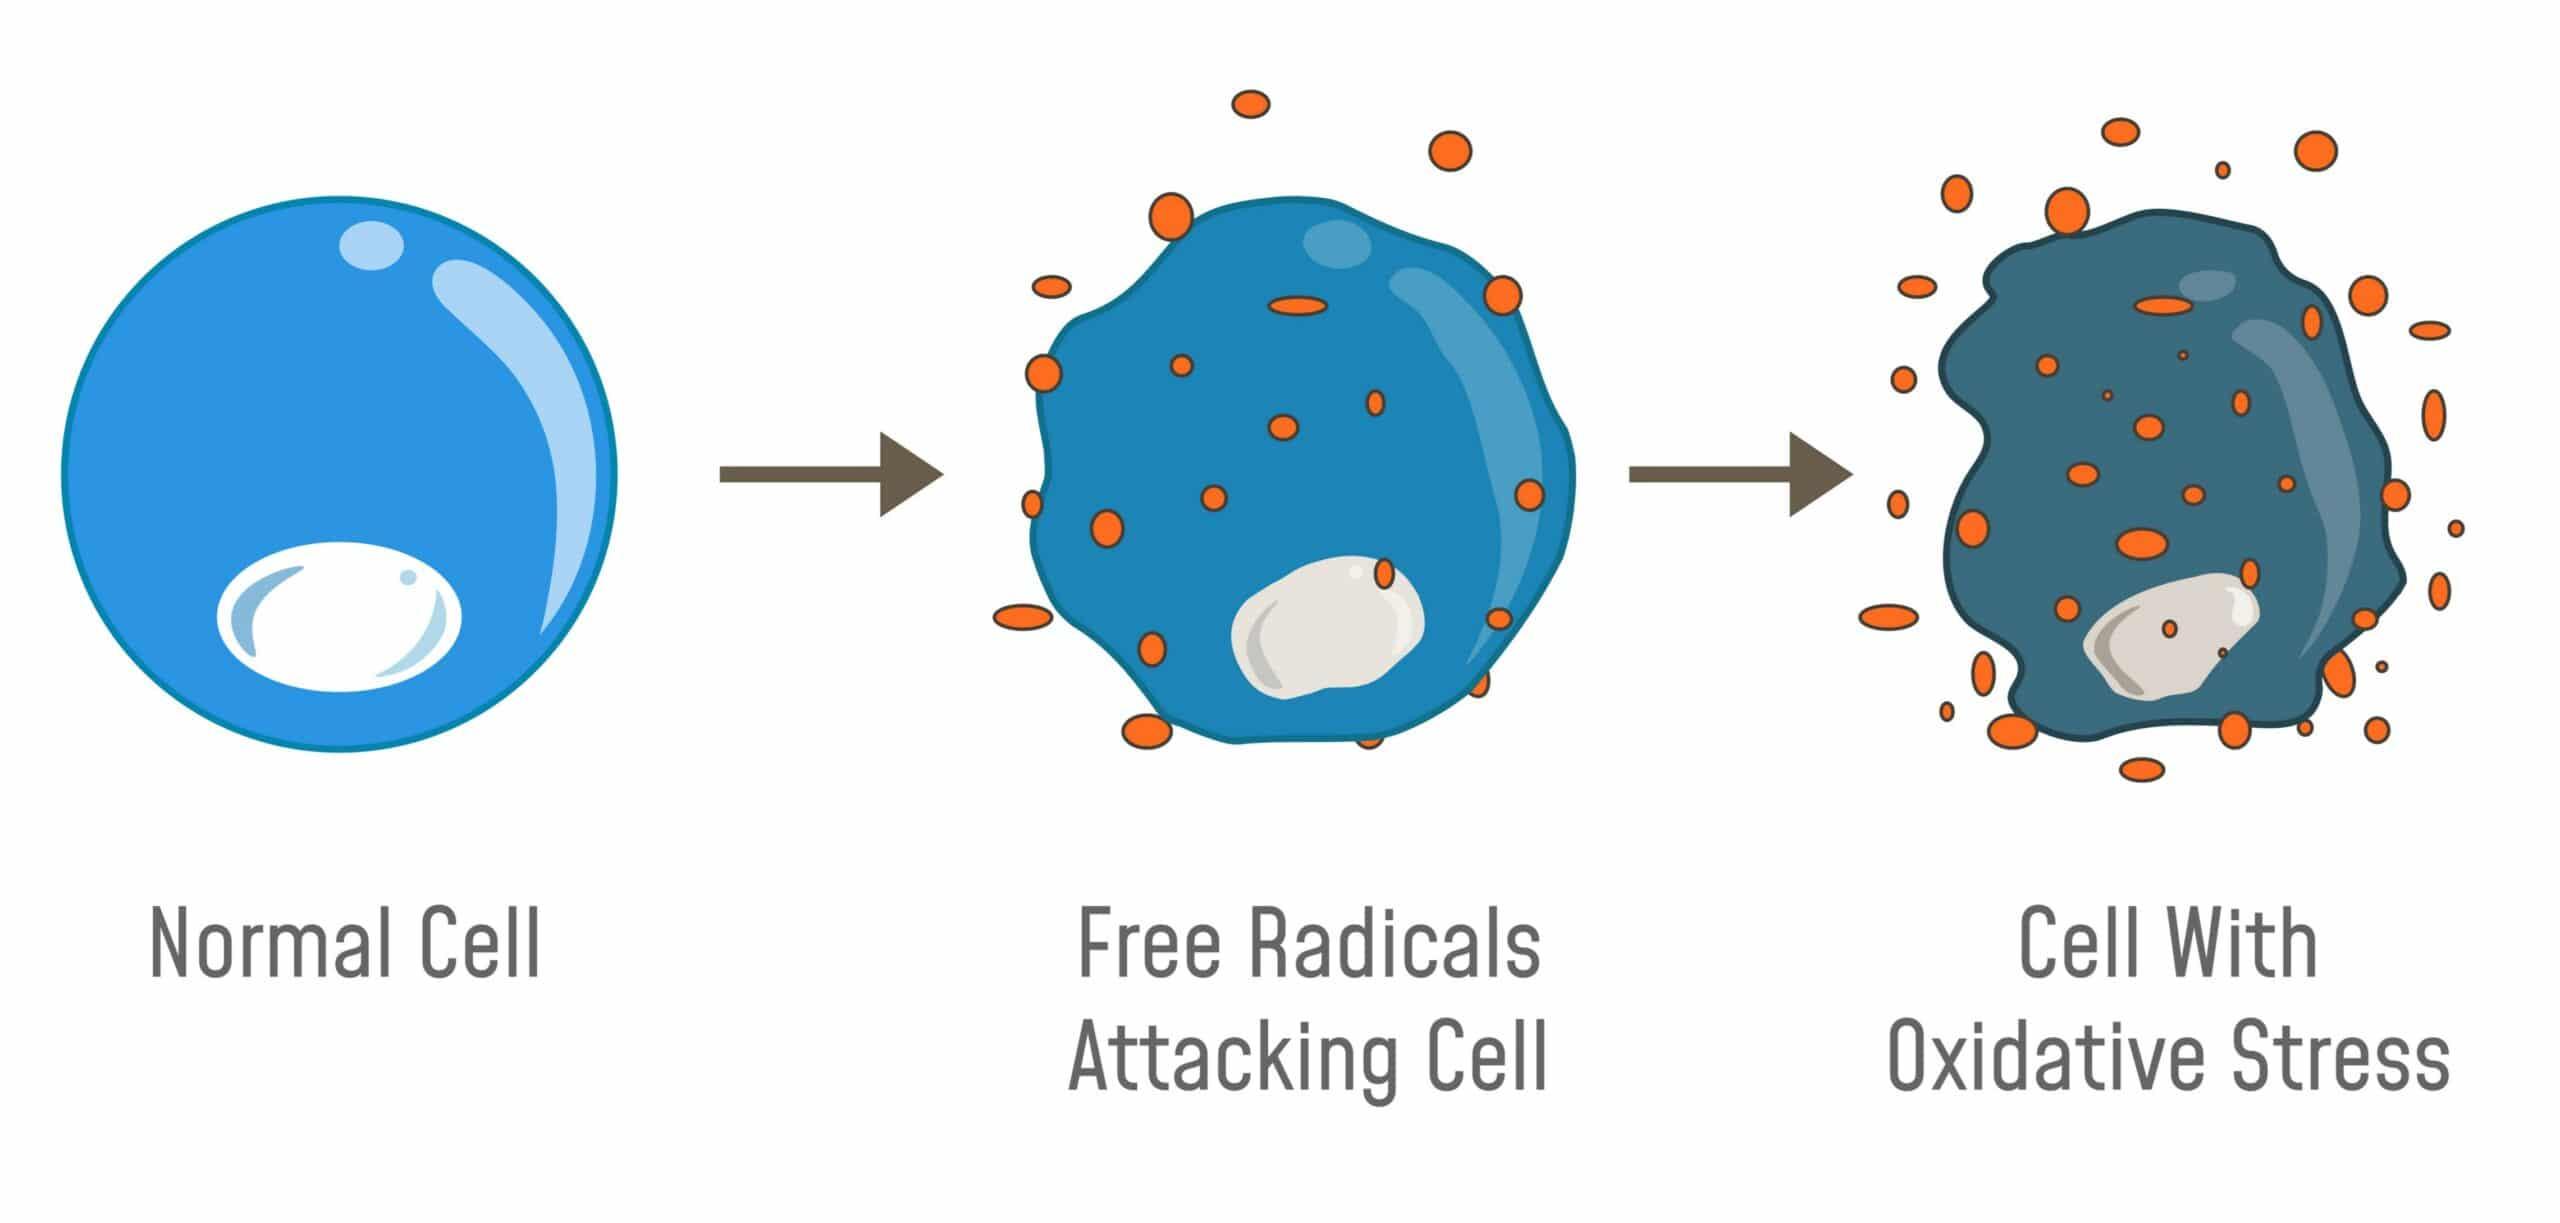 radicali liberi fanno male